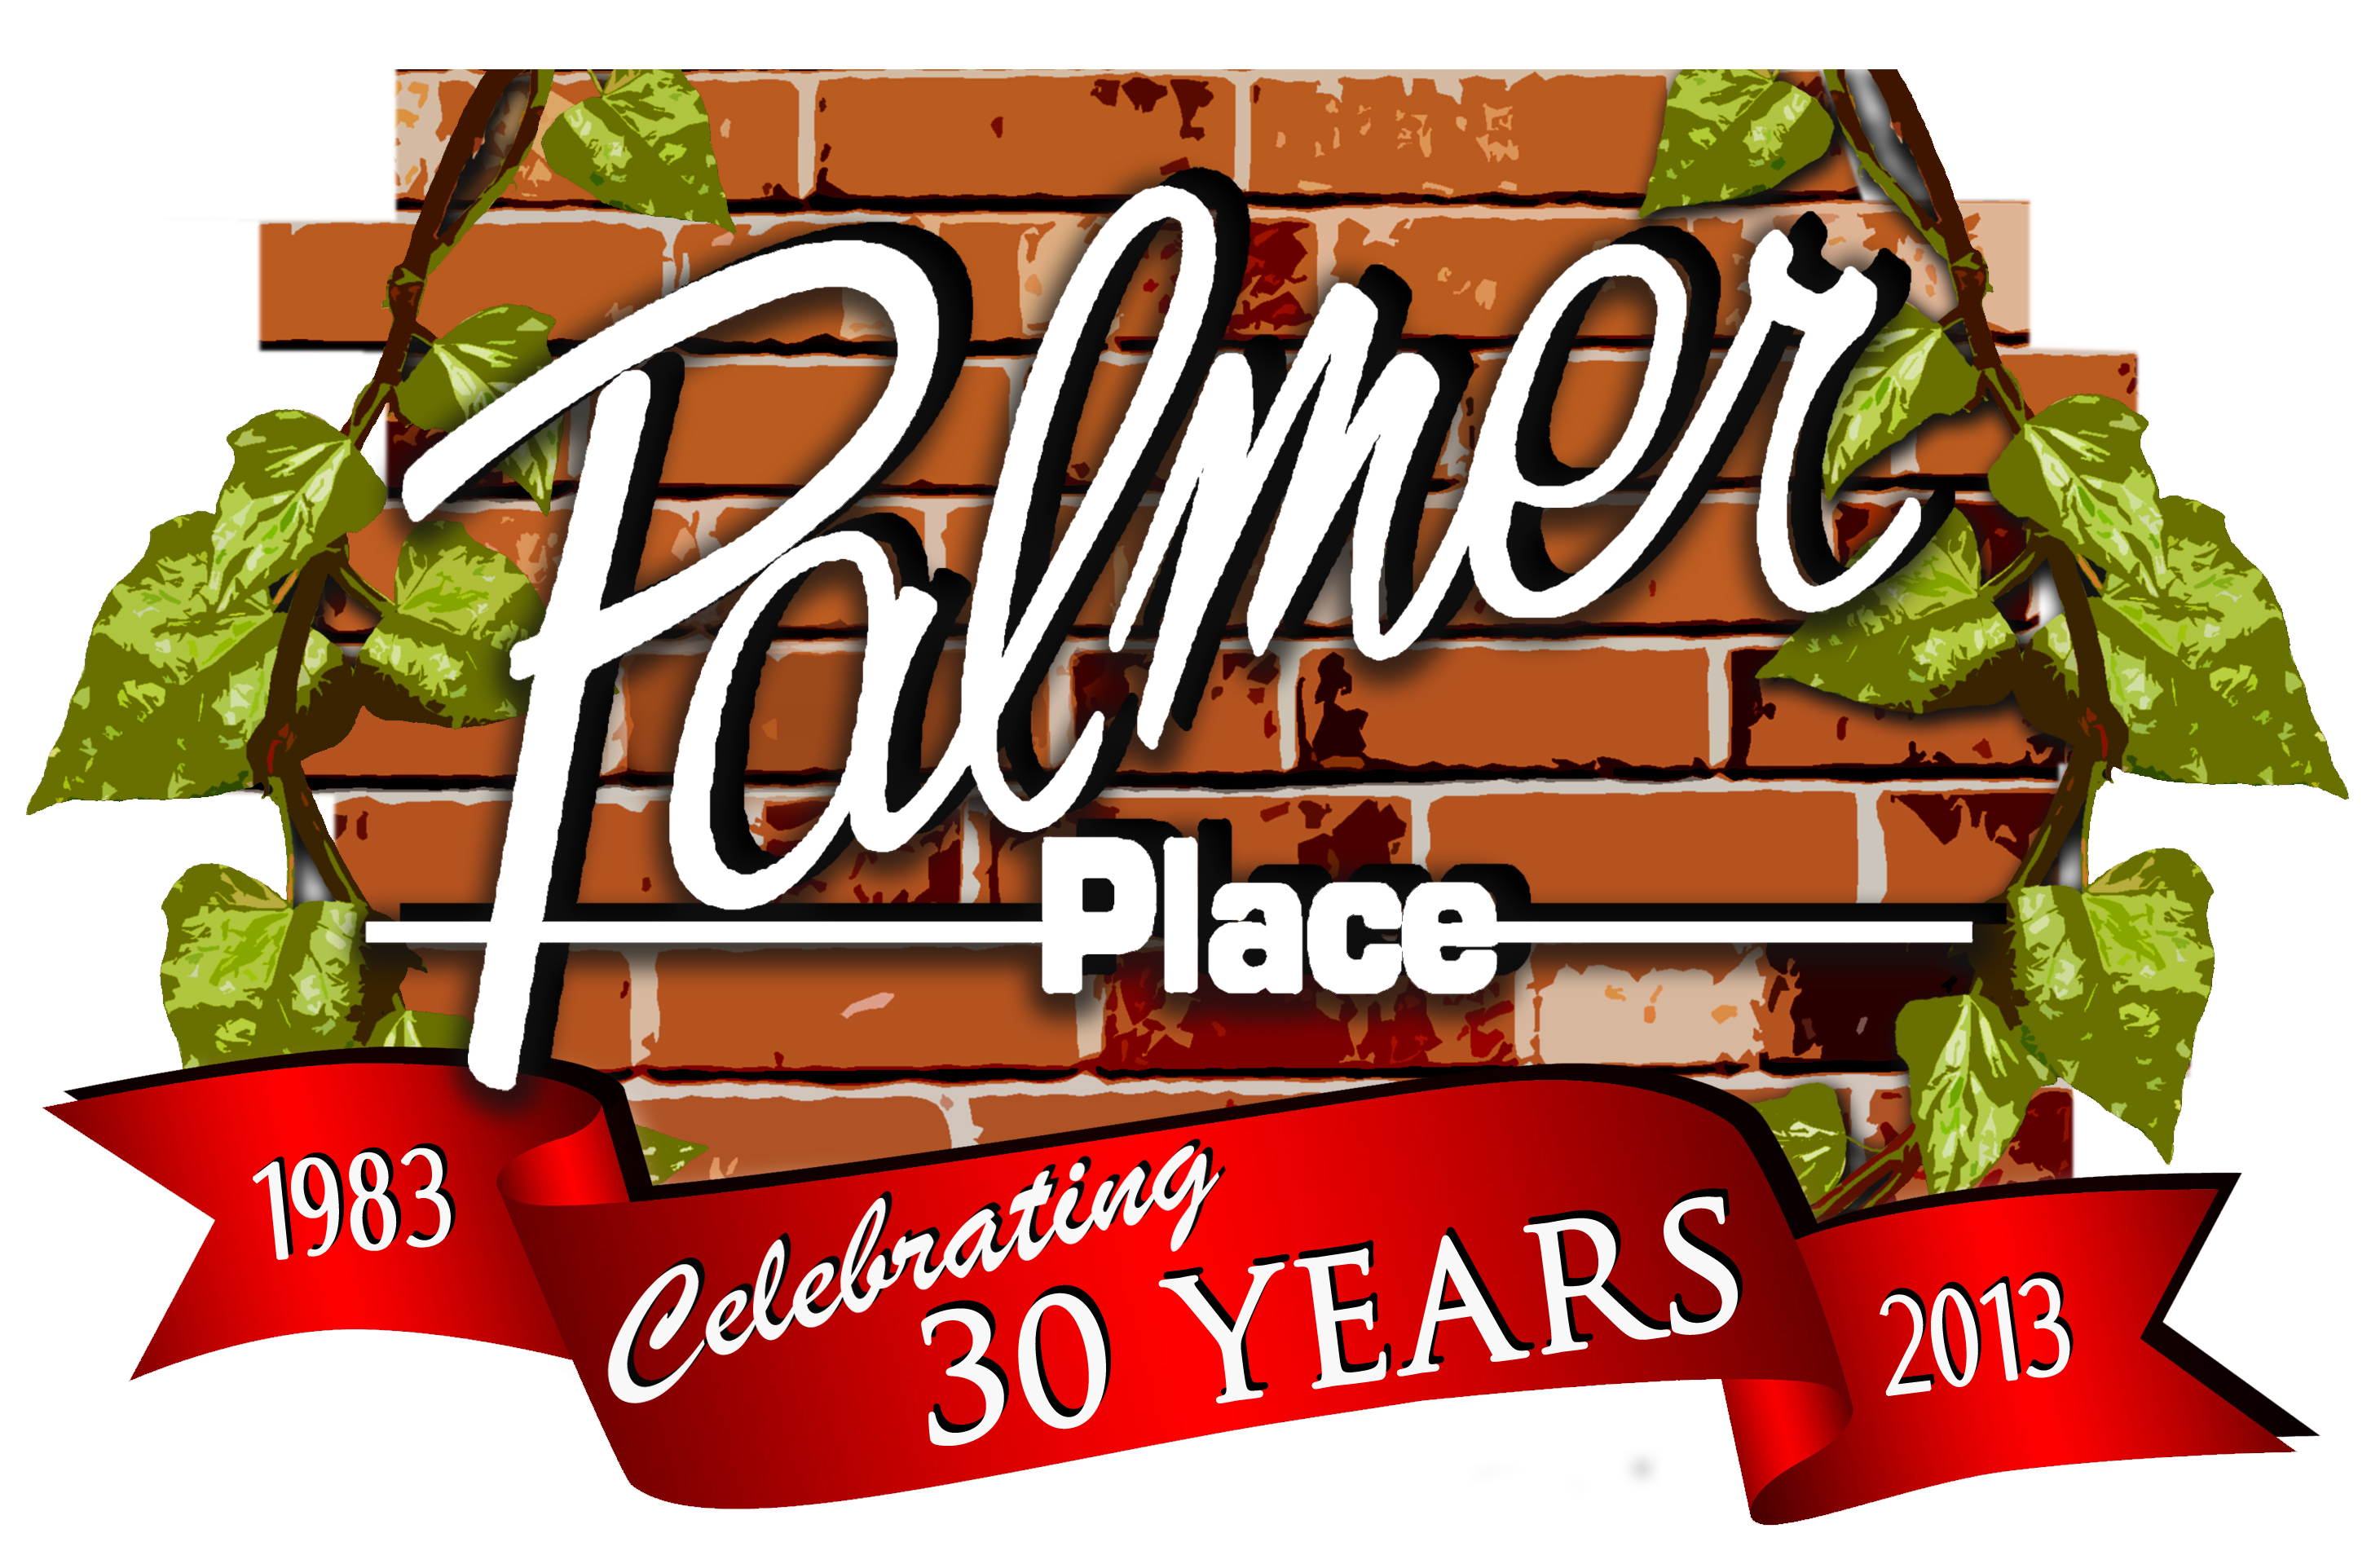 Palmer Place